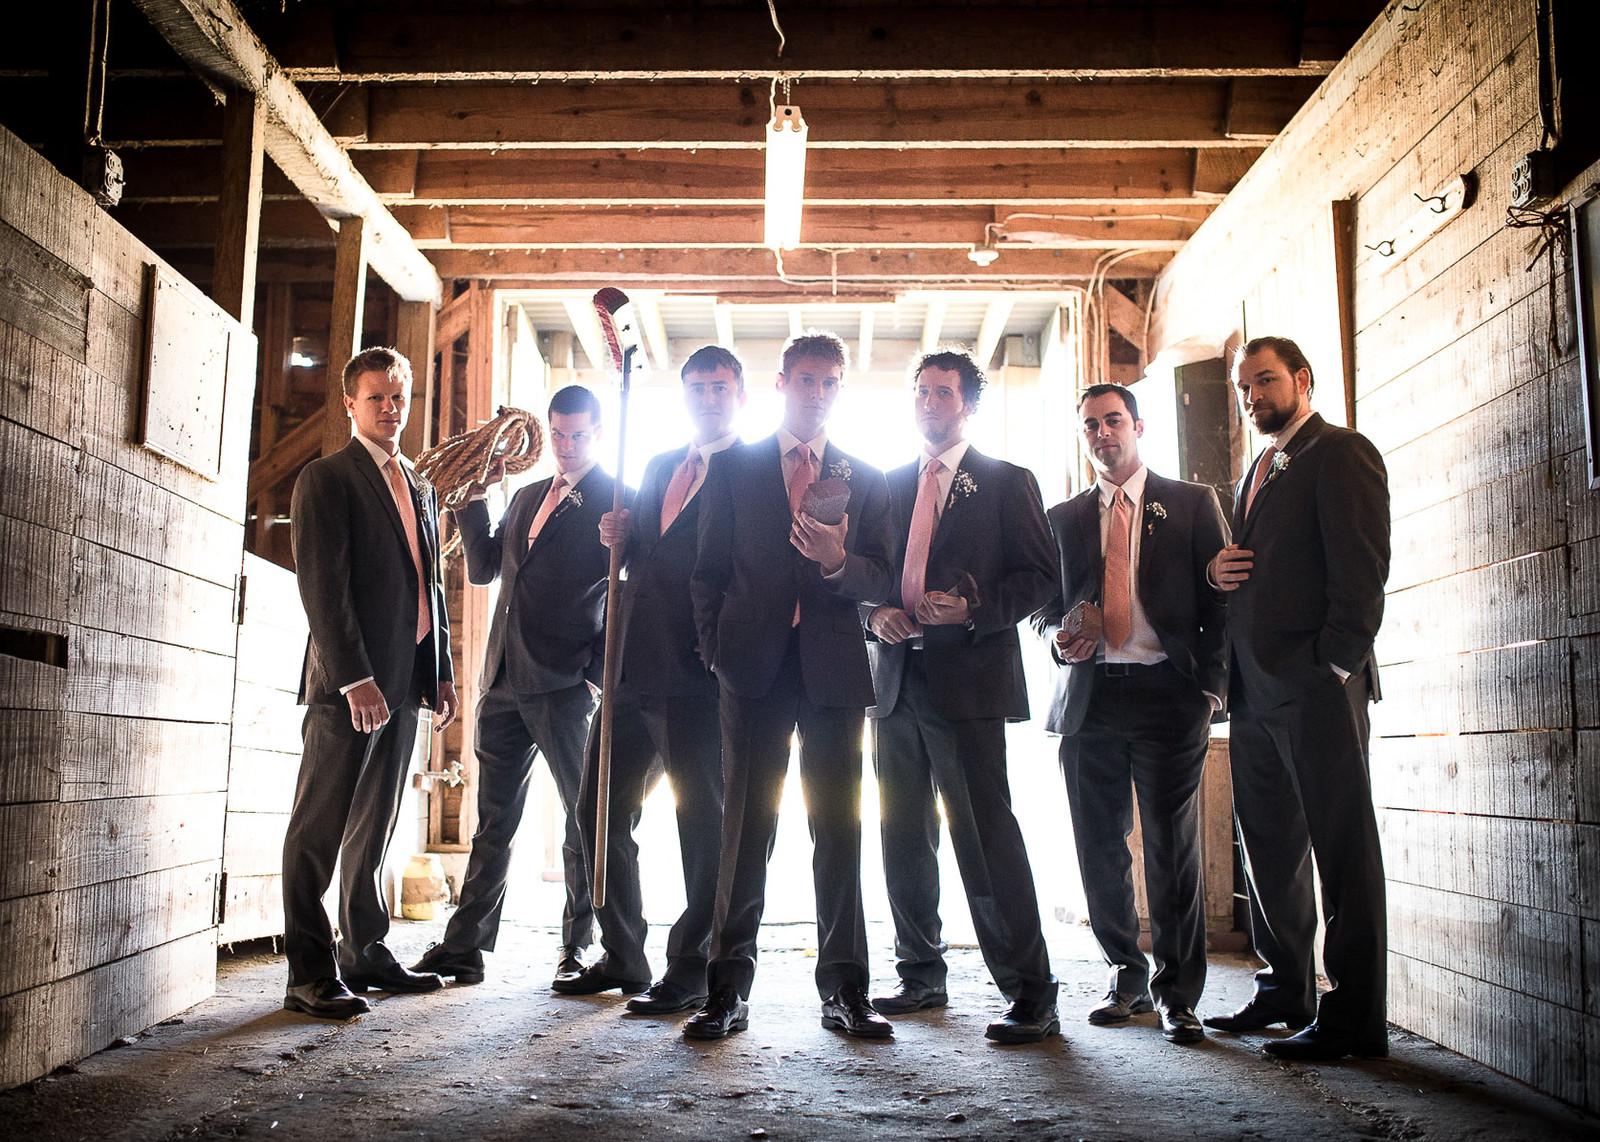 creative groomsmen poses wedding photorapher in richmond va